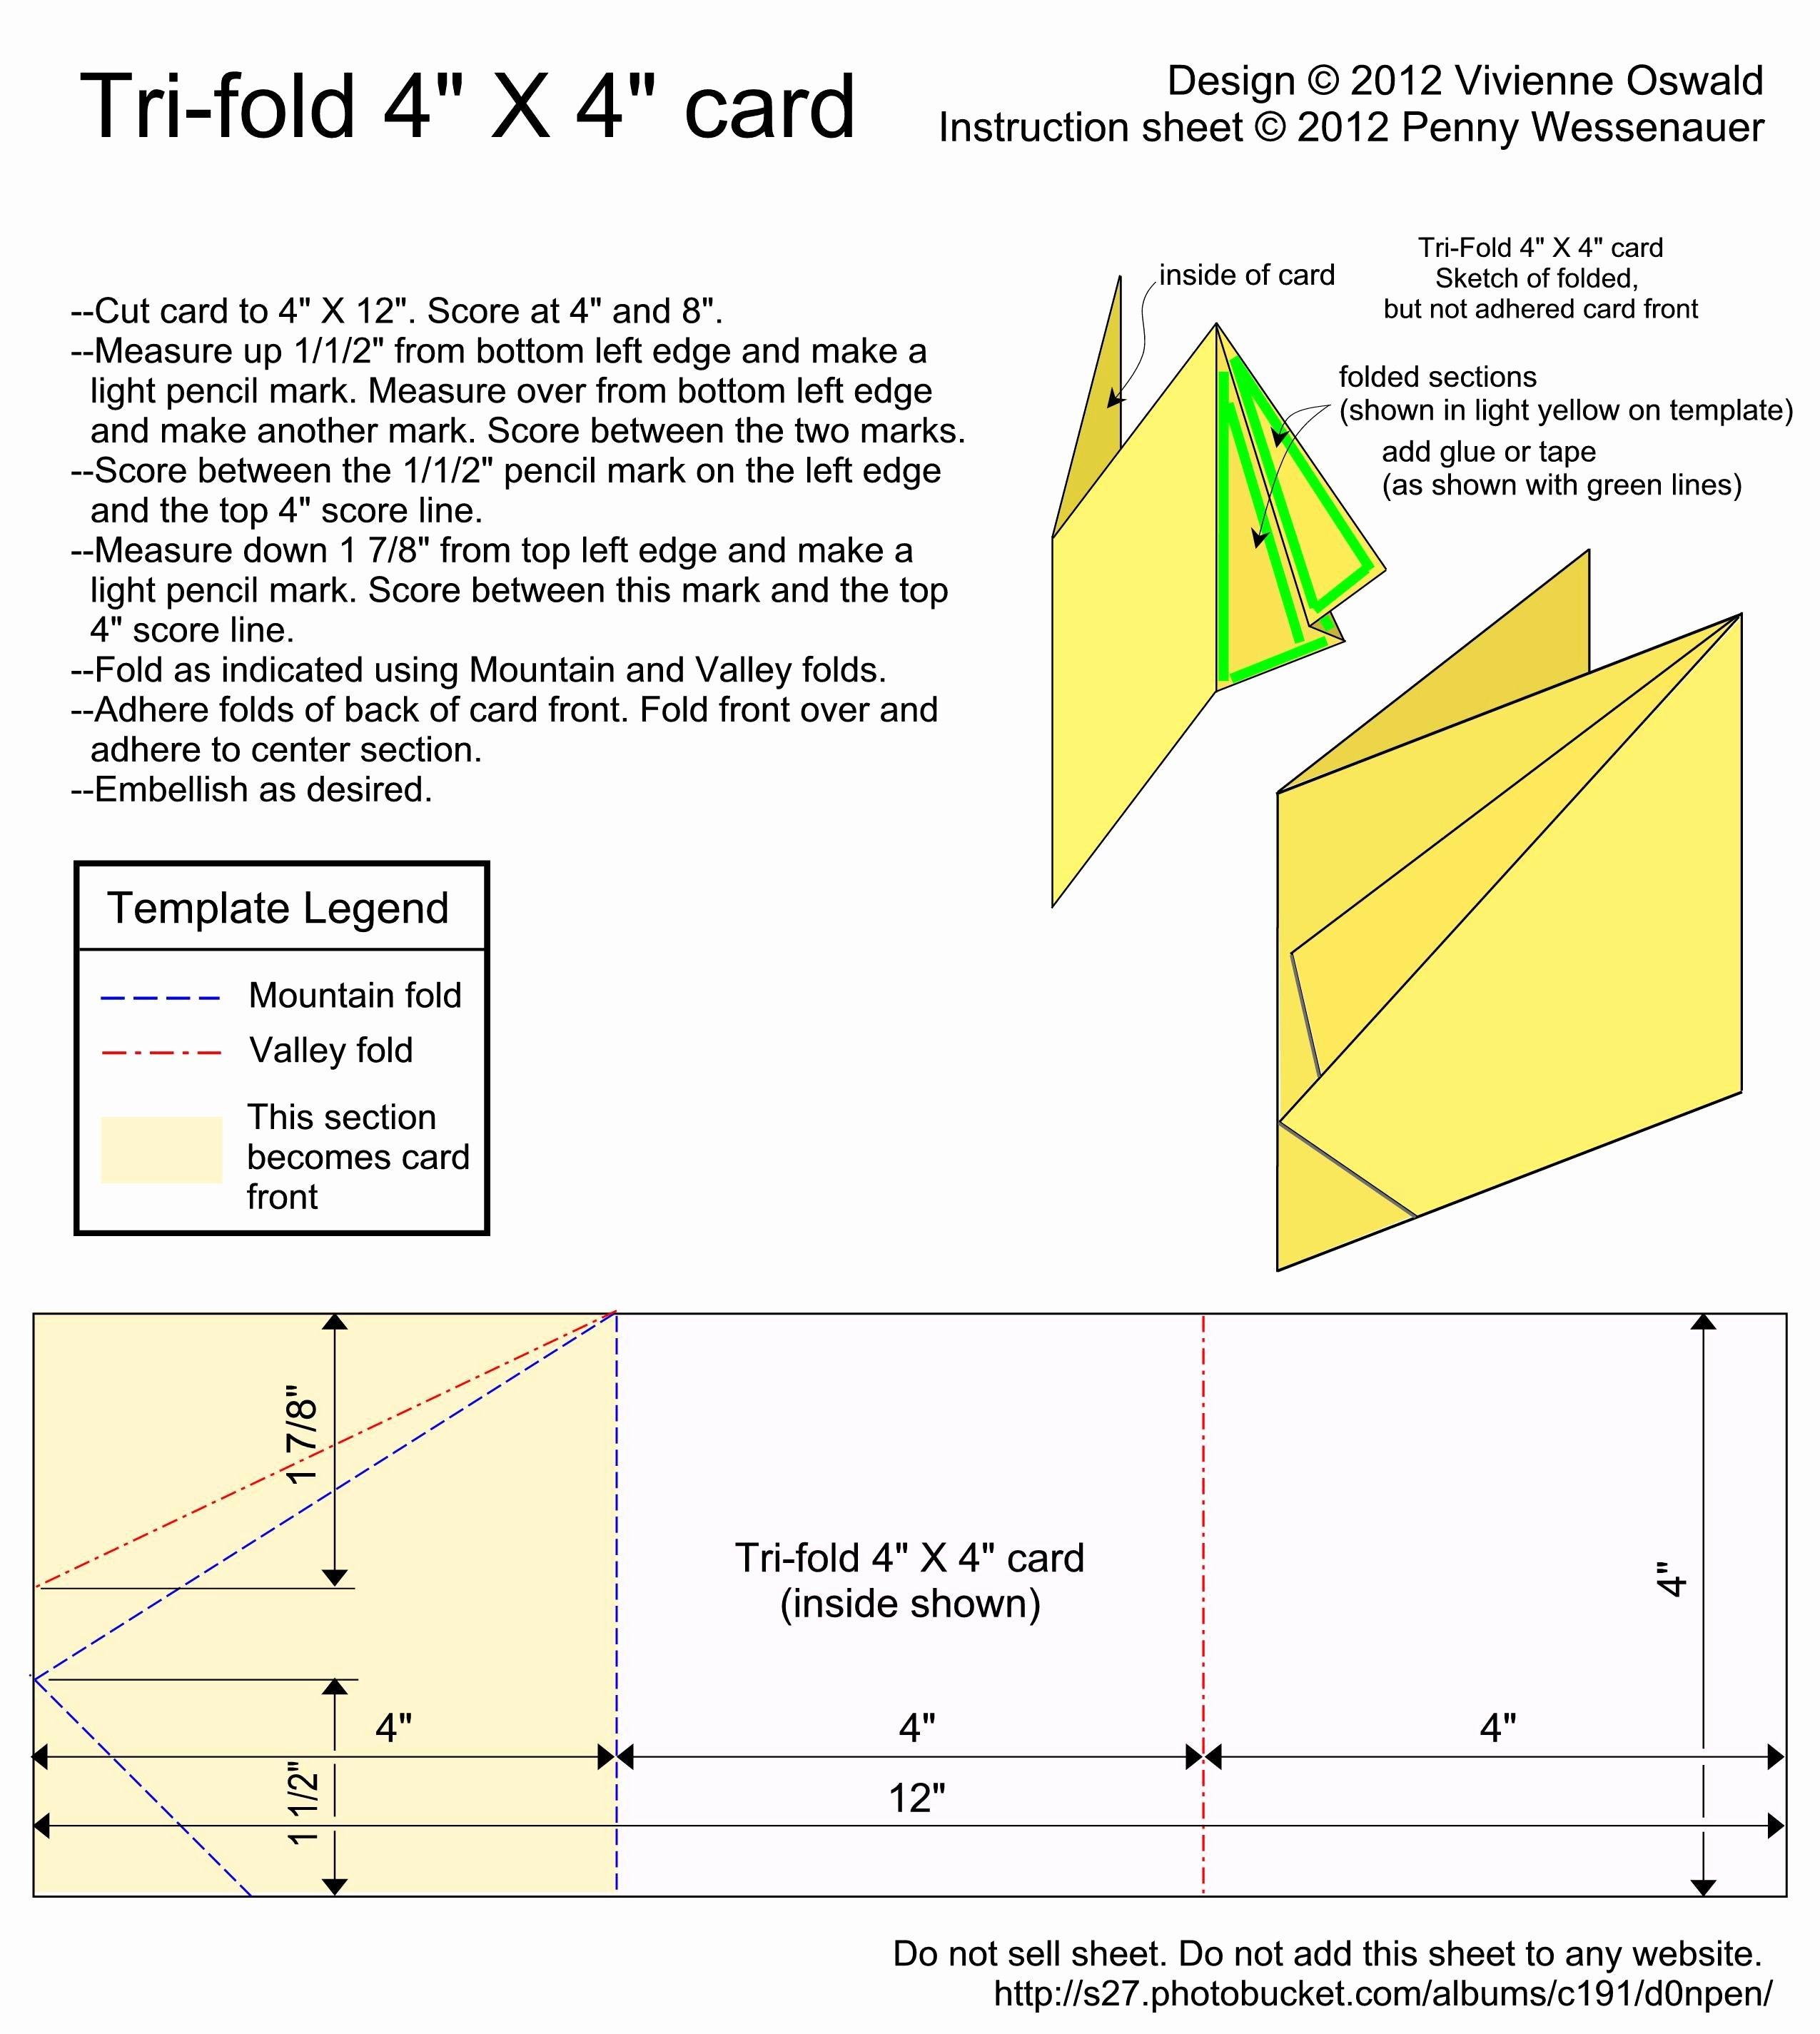 Tri Fold Card Templates Unique Card Templates Tri Fold 4x4 Card Image by D0npen